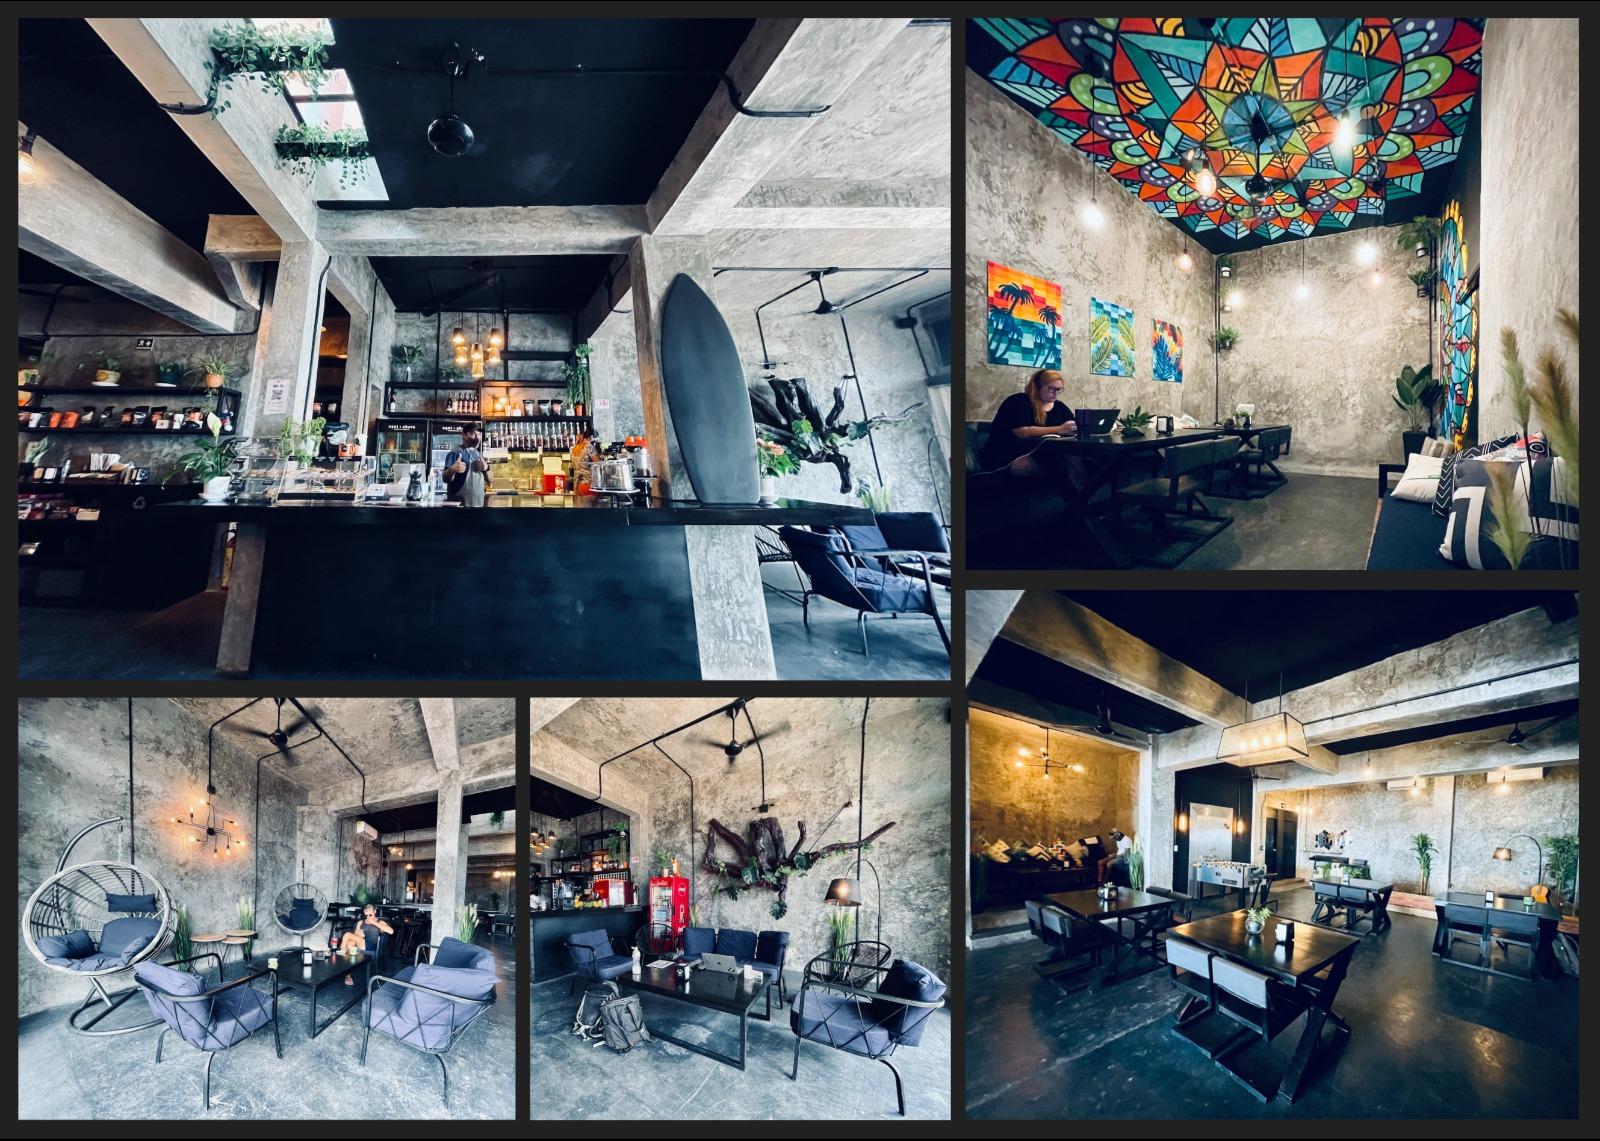 Best Cafes in Cozumel